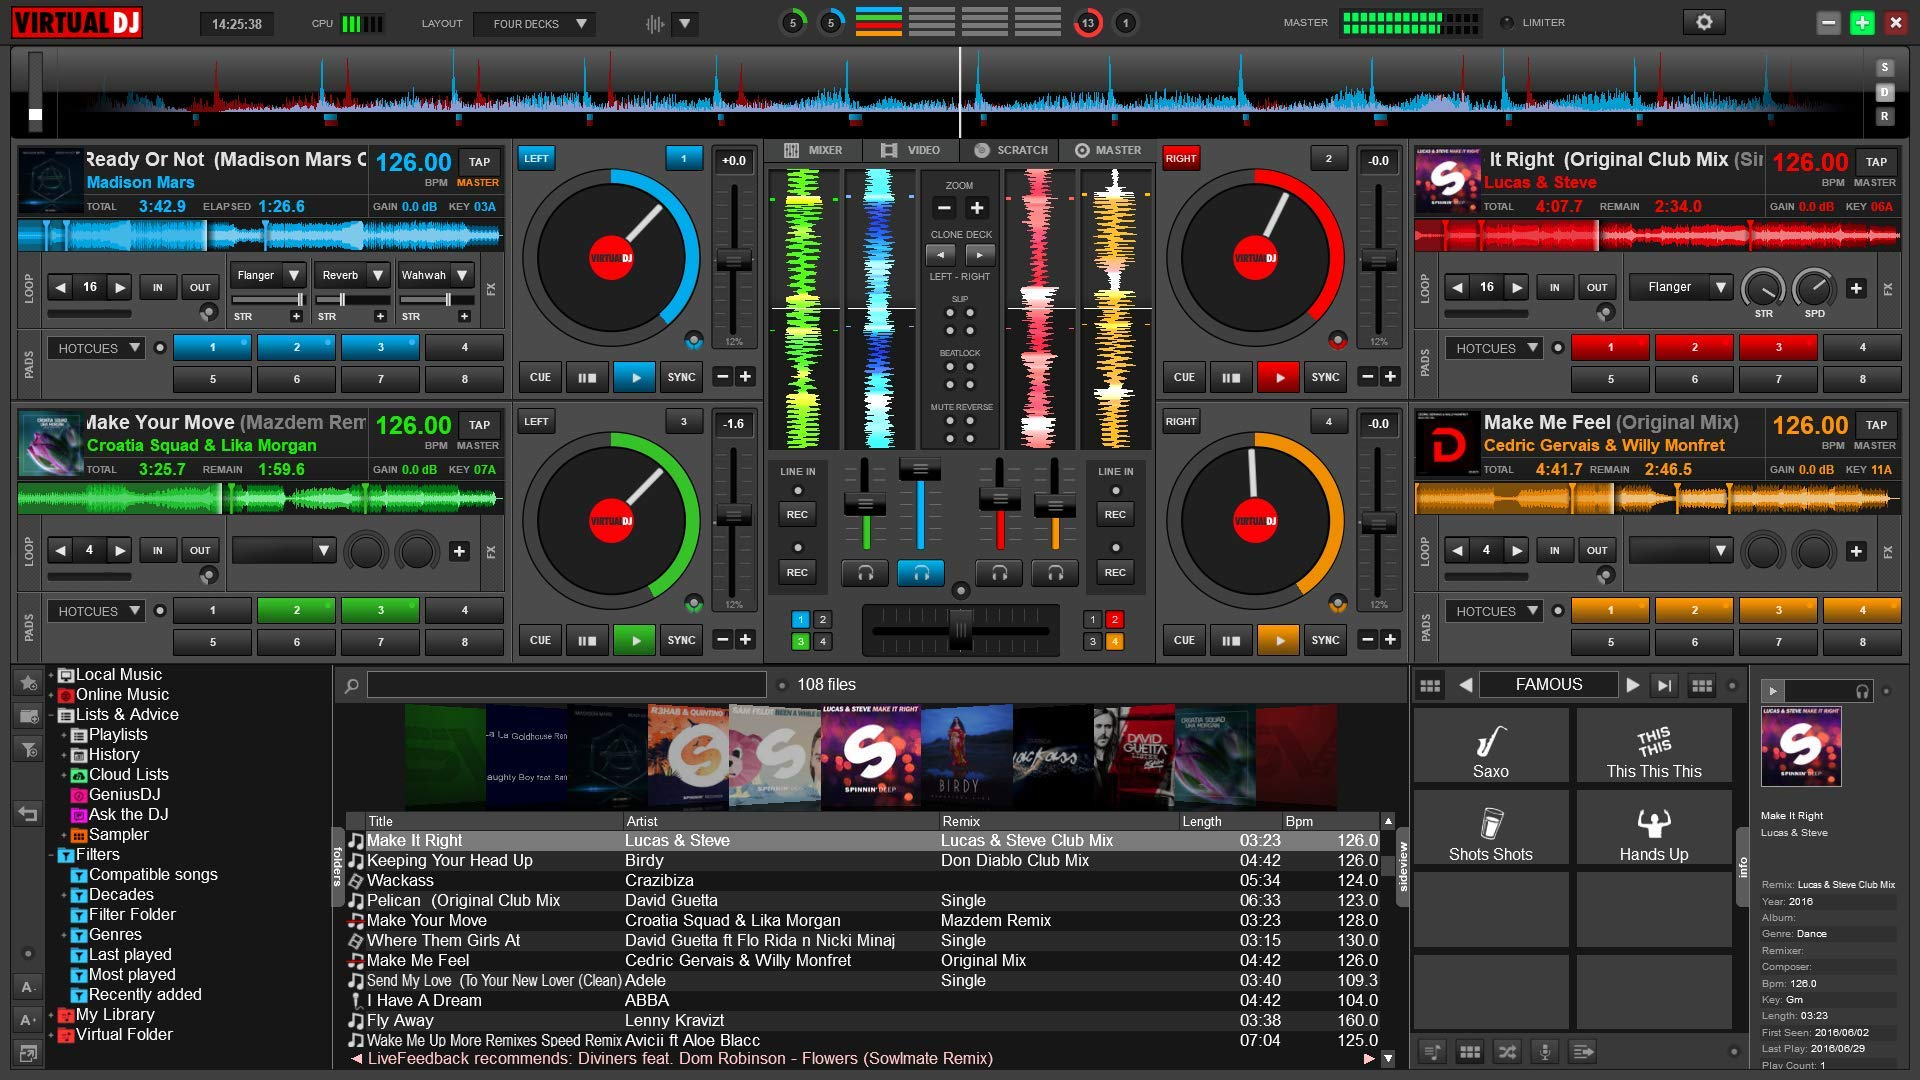 Virtual dj le key code   Virtual DJ 8 Free Download Full Version